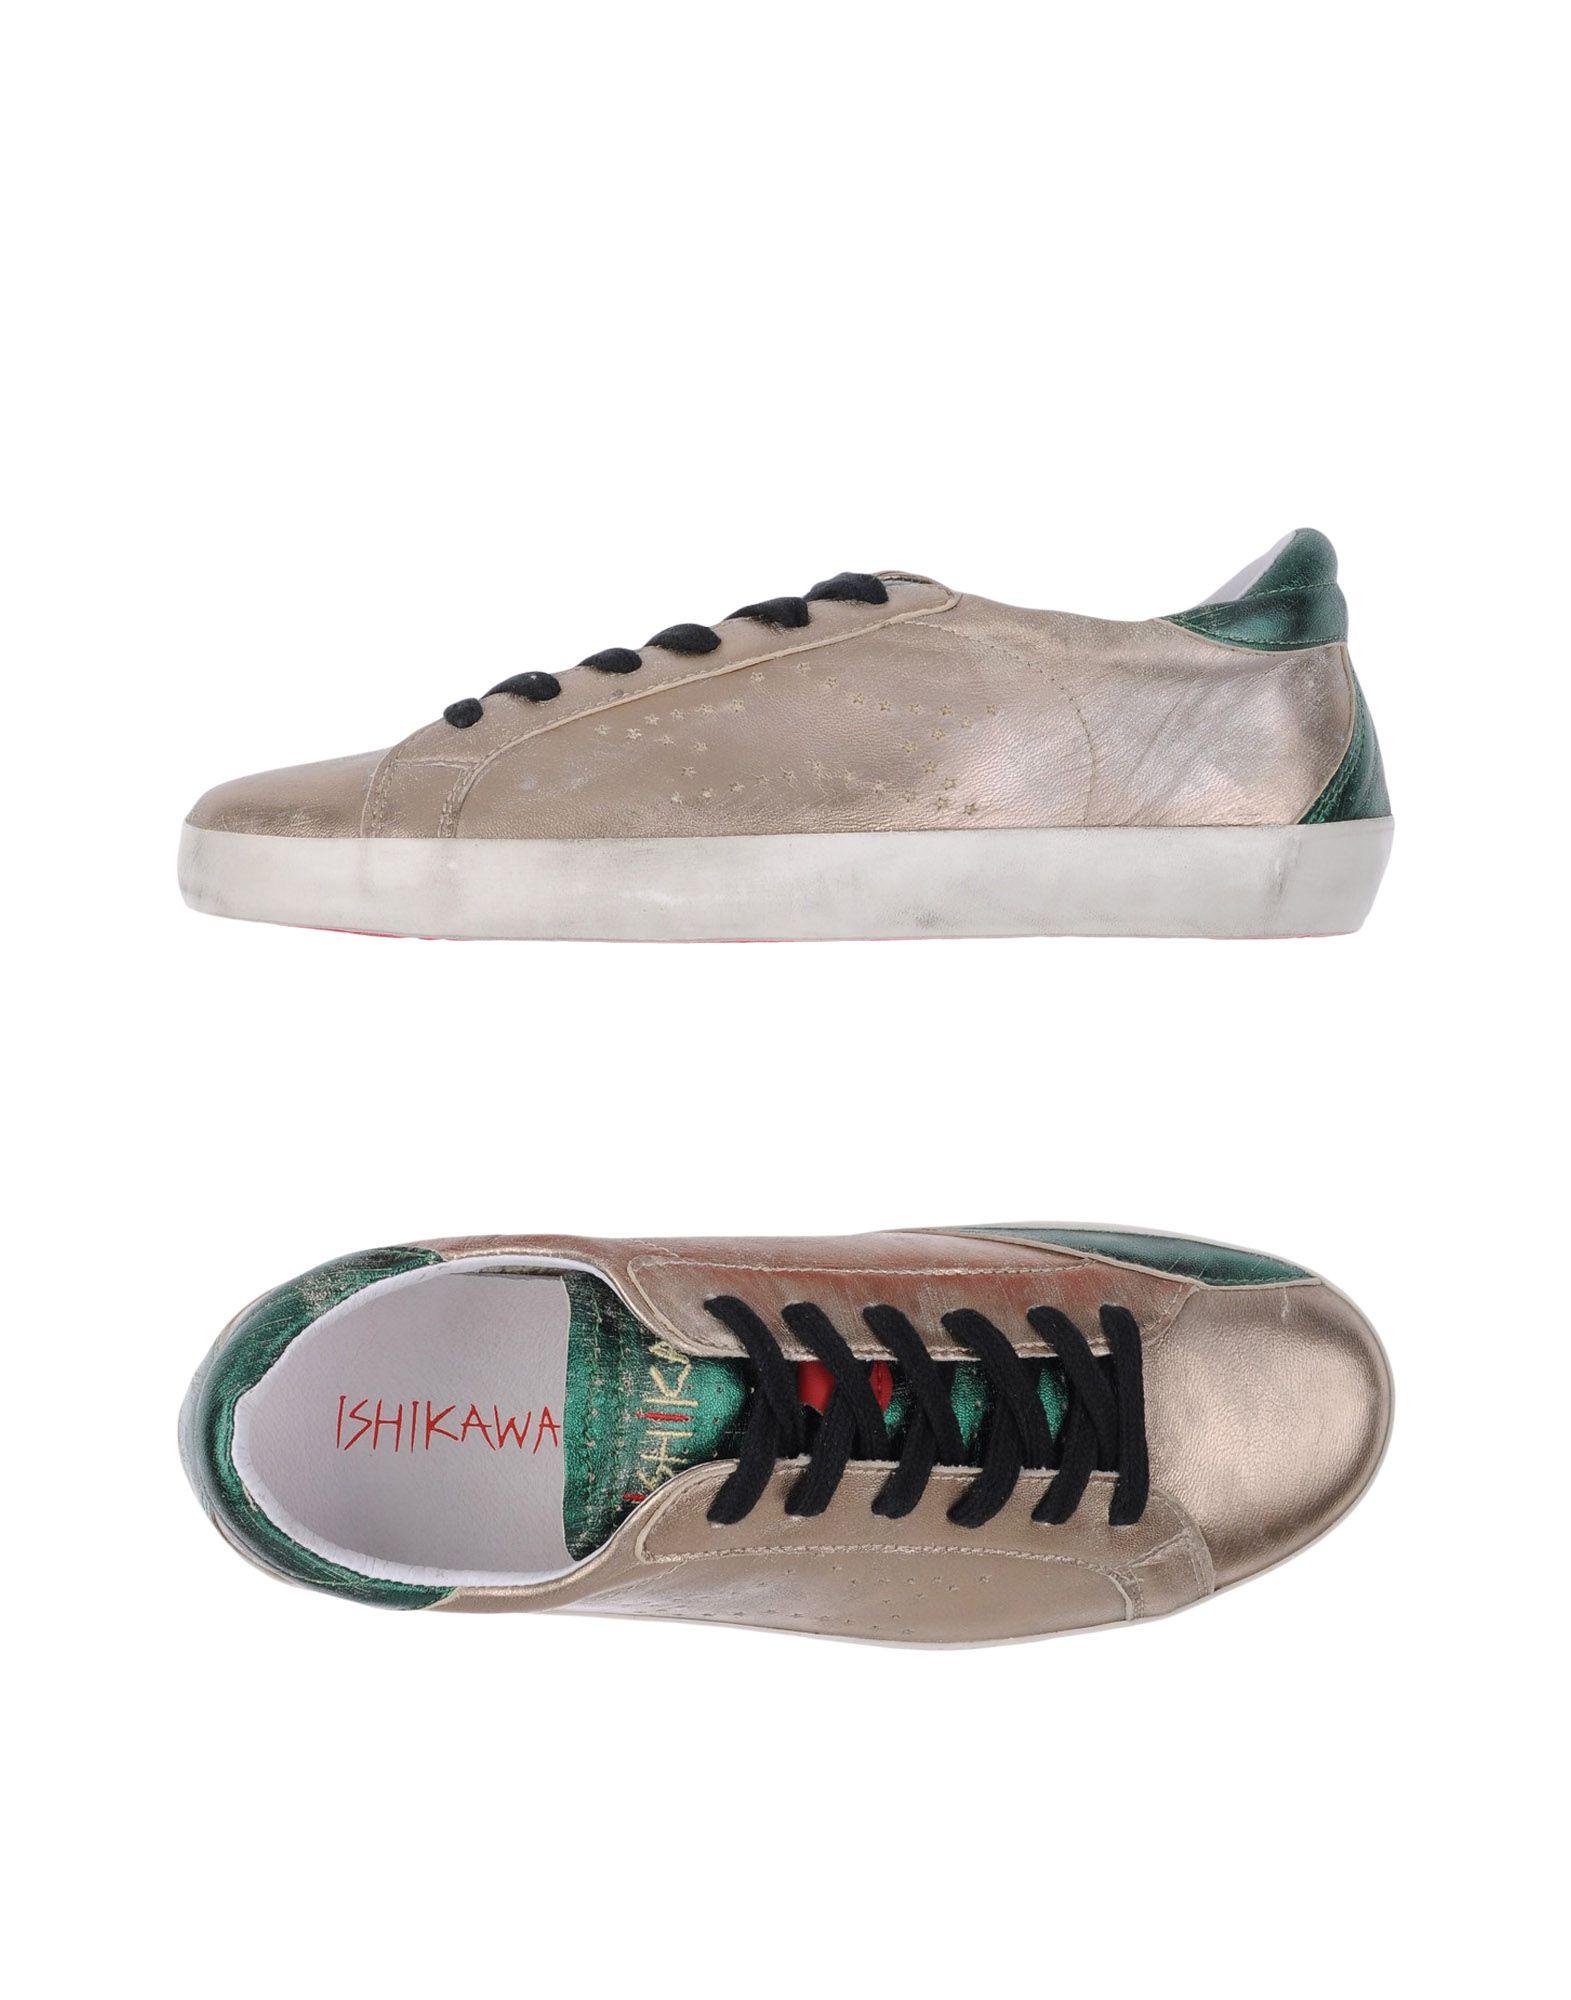 Moda Sneakers Ishikawa Uomo Uomo Ishikawa - 11180847LS 3d84af